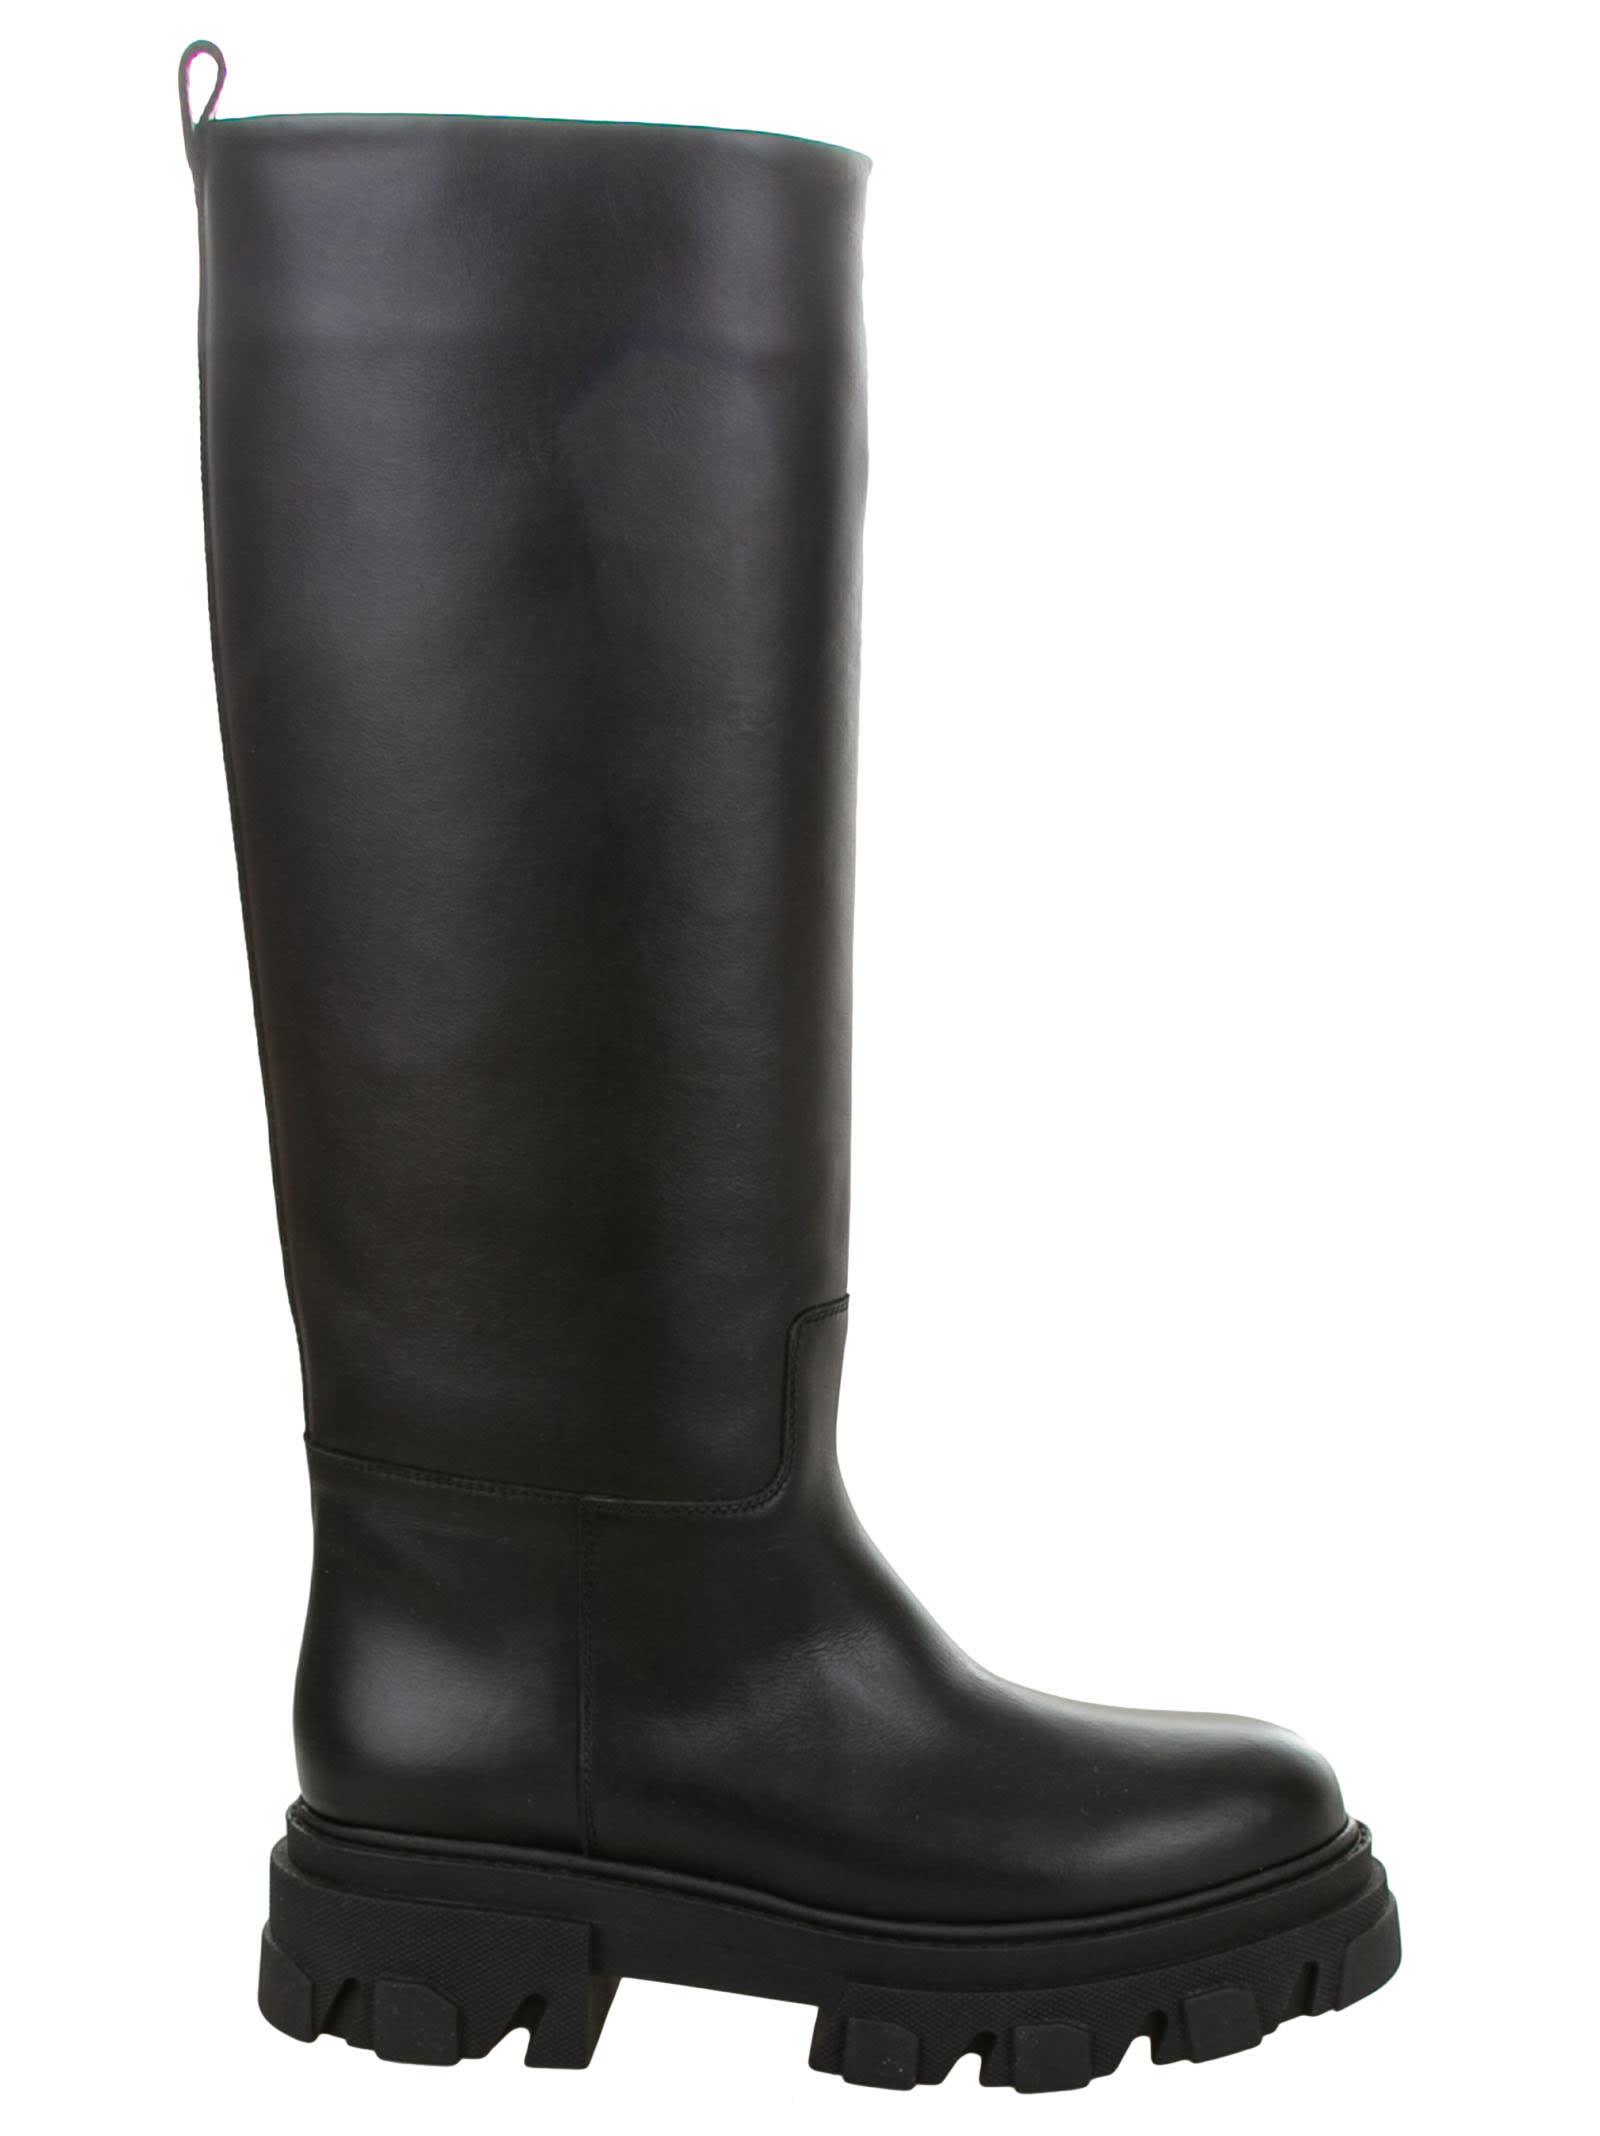 Gia X Pernille Teisbaek Perni Rain Boots